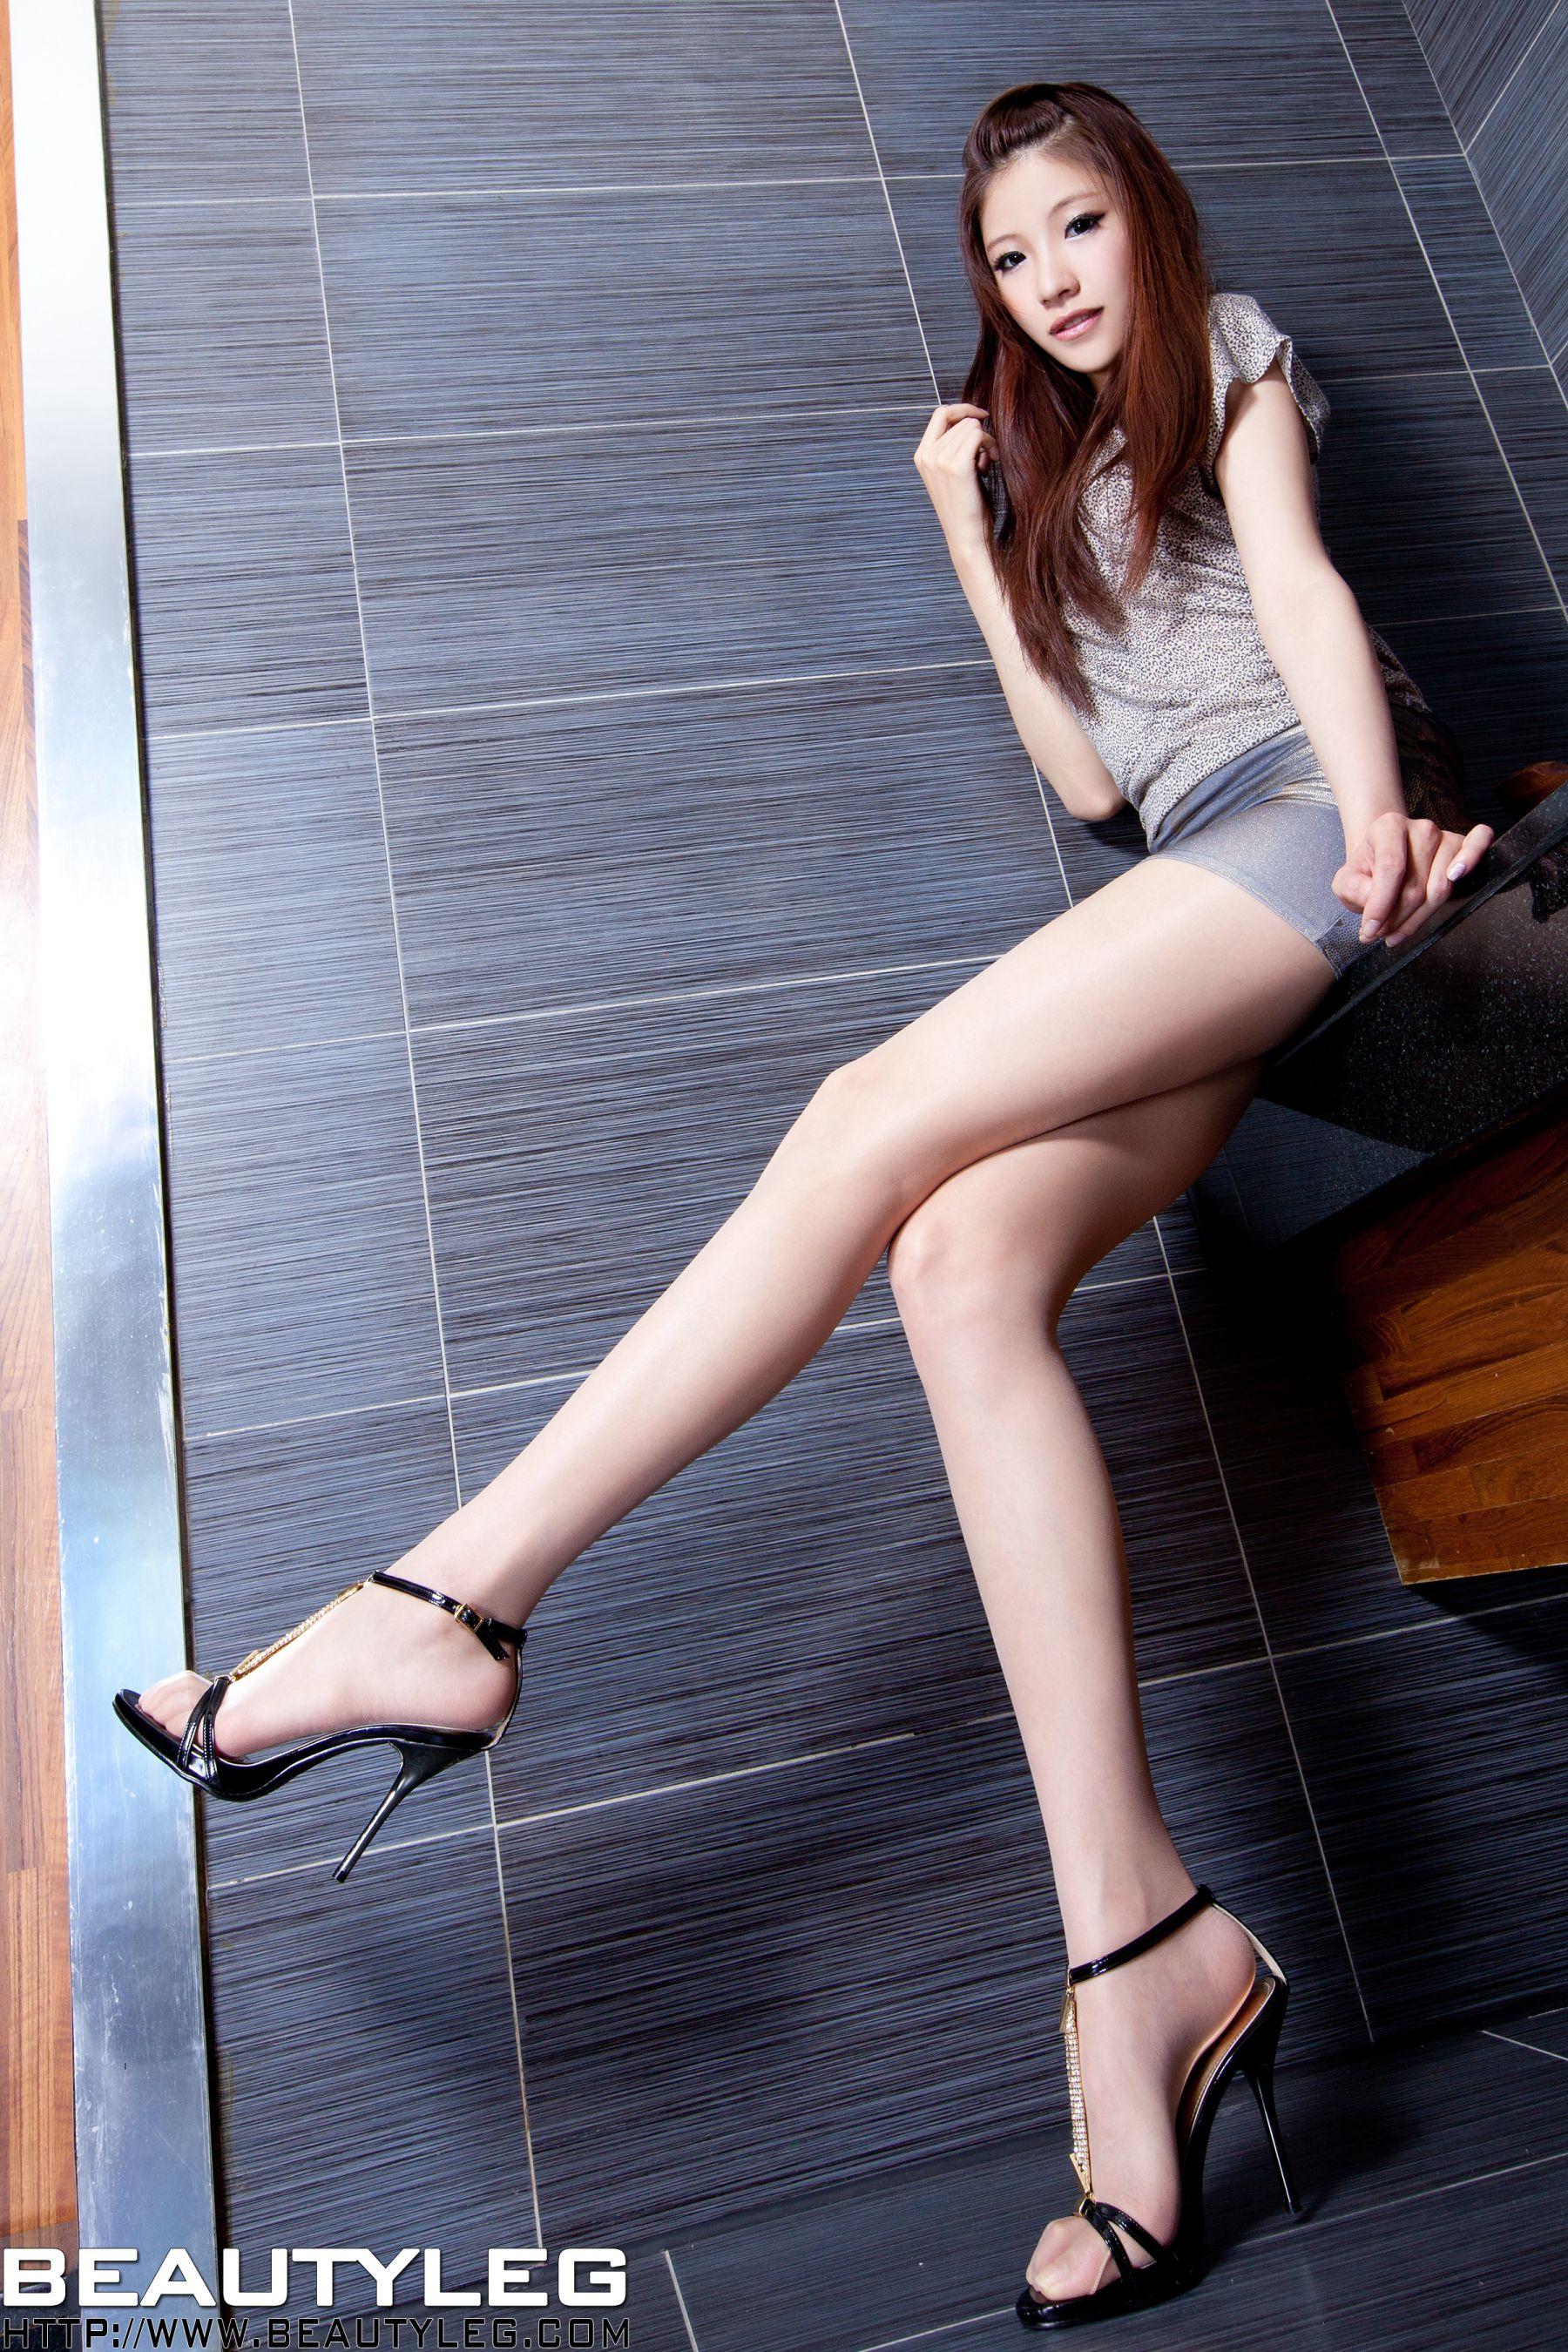 VOL.1089 [Beautyleg]美腿白丝丝袜制服:陈玉雪(腿模Abby)高品质写真套图(51P)